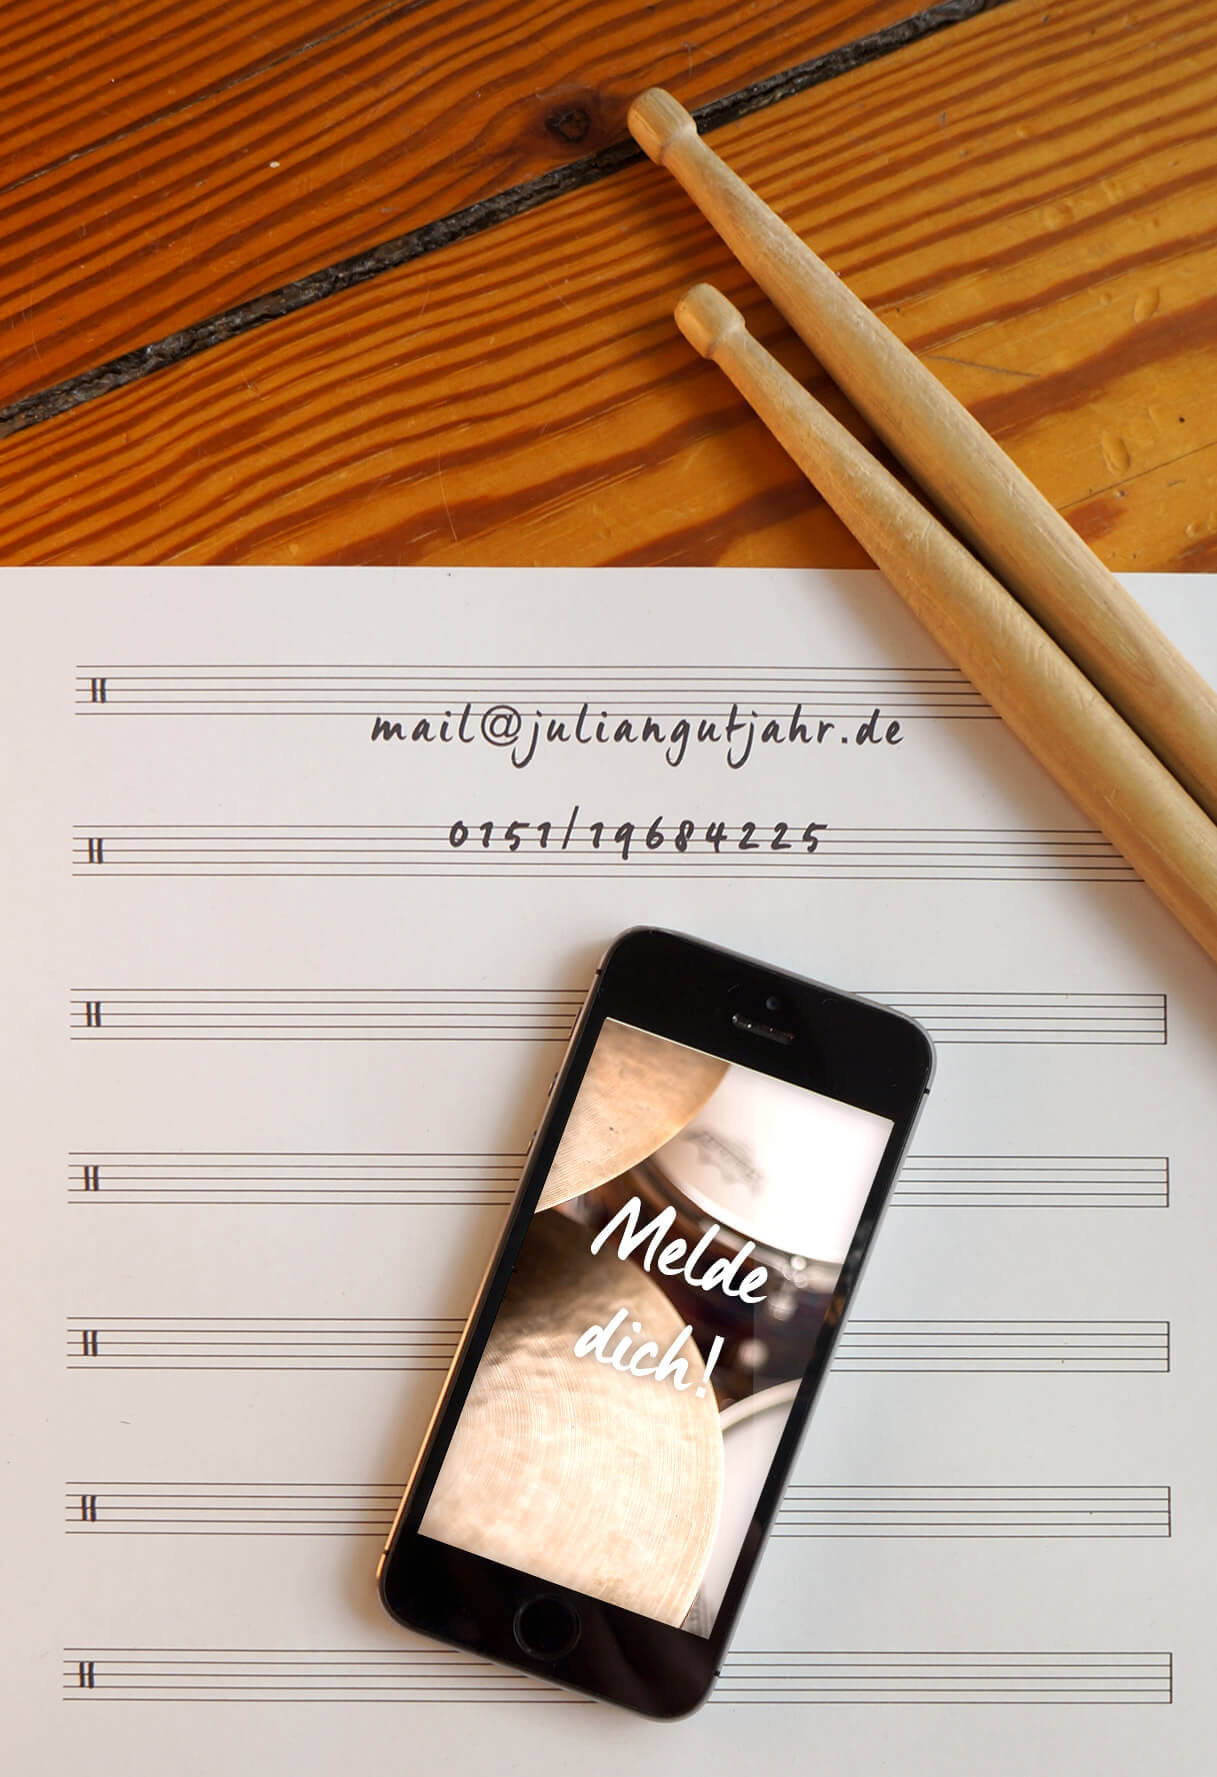 Kontakt-Foto-Sticks-Smartphone-Notenblatt-Julian-Gutjahr-Schlagzeugunterricht-Hamburg-Eimsbüttel